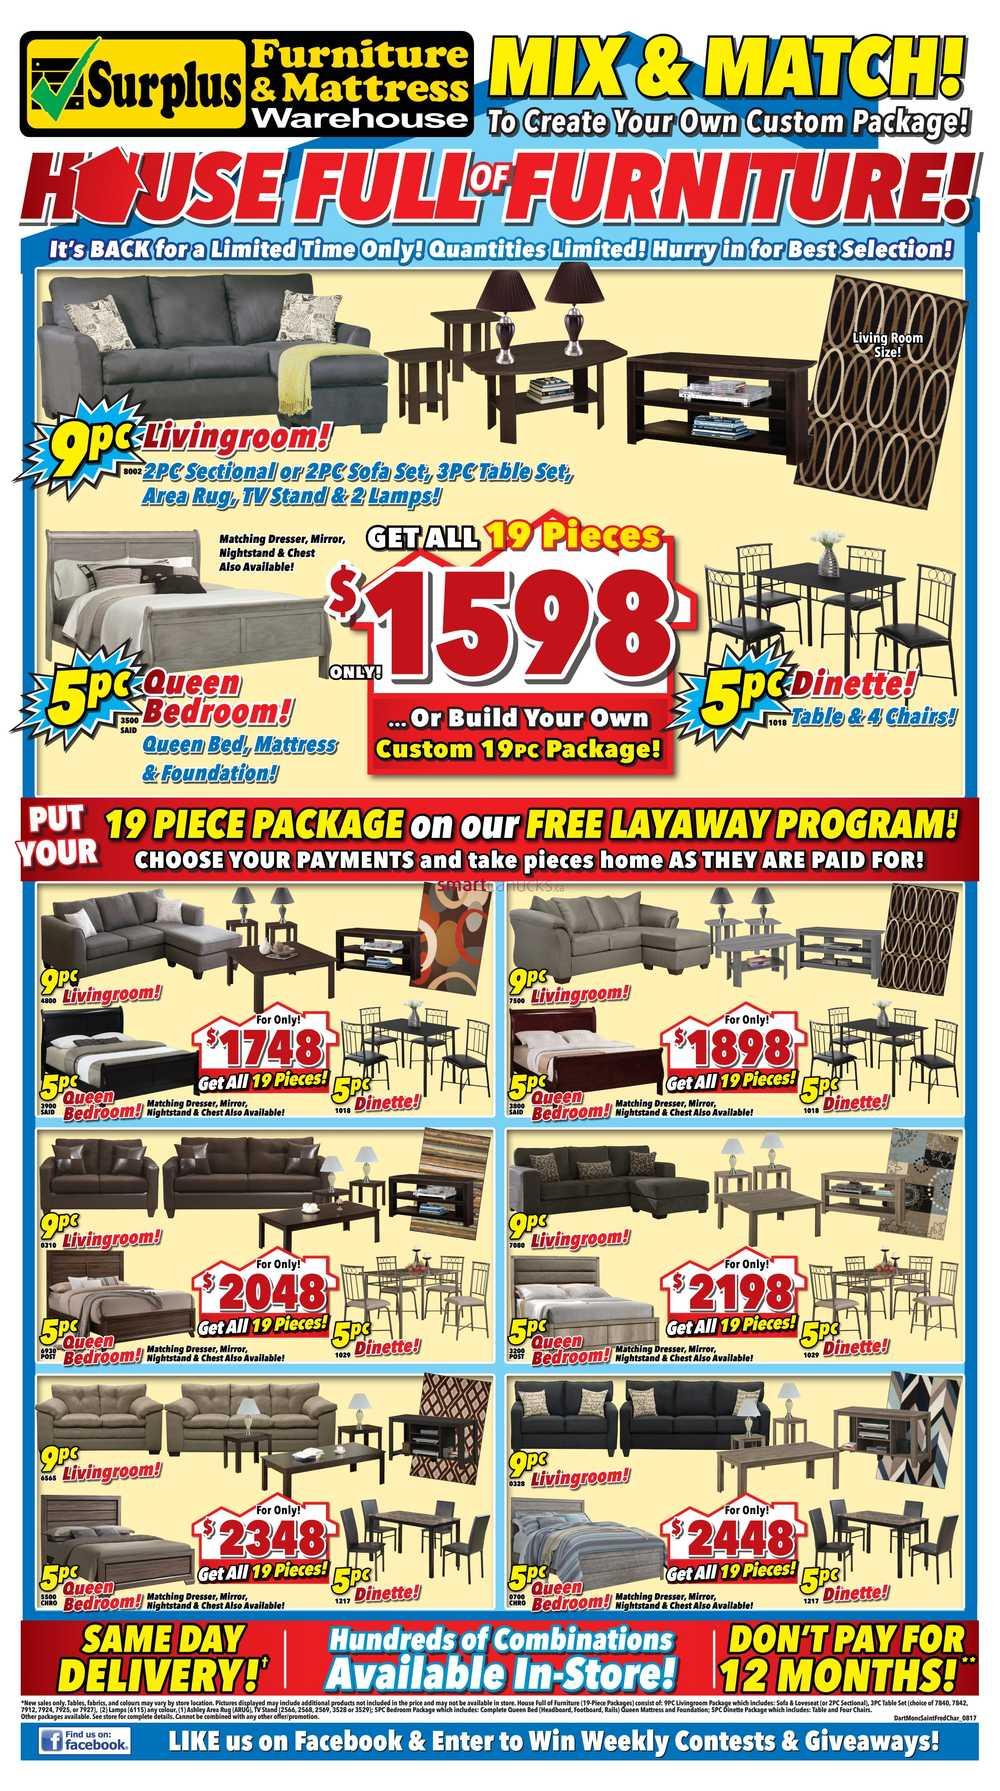 surplus furniture and mattress warehouse canada flyers With surplus furniture and mattress warehouse london